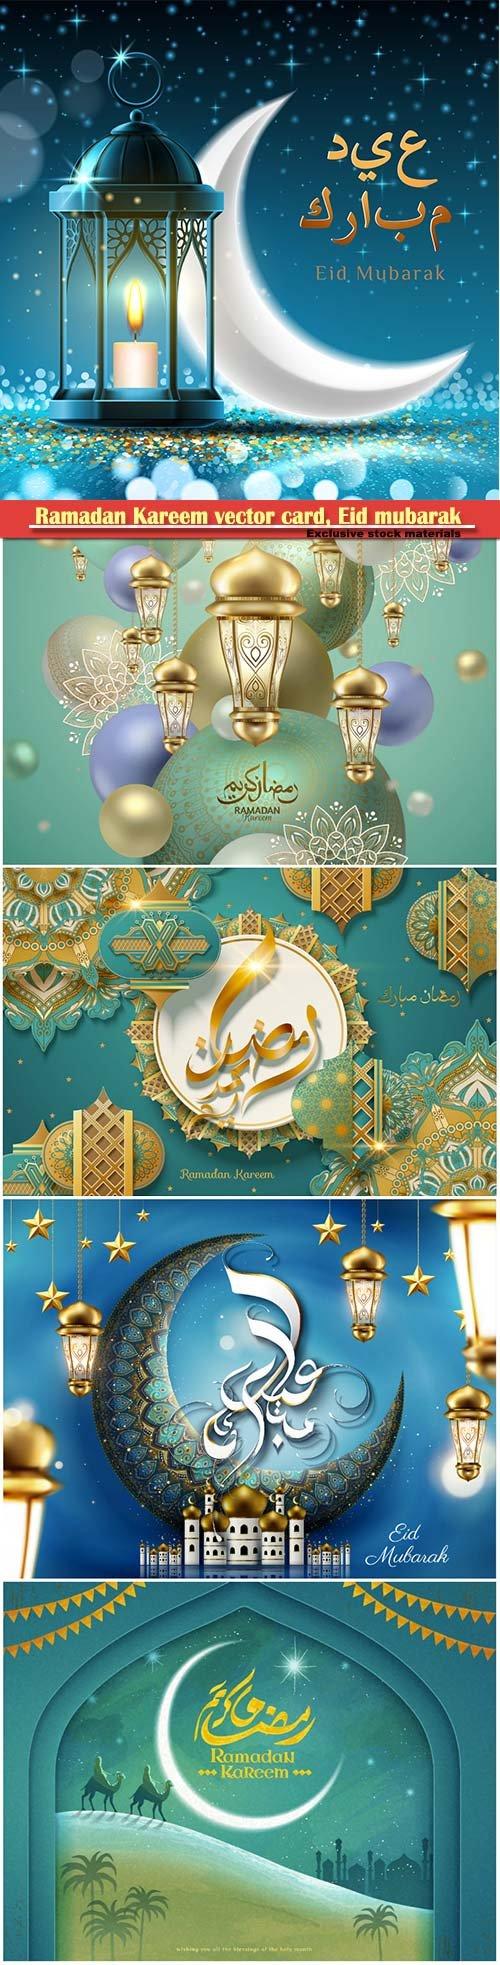 Ramadan Kareem vector card, Eid mubarak calligraphy design templates # 20